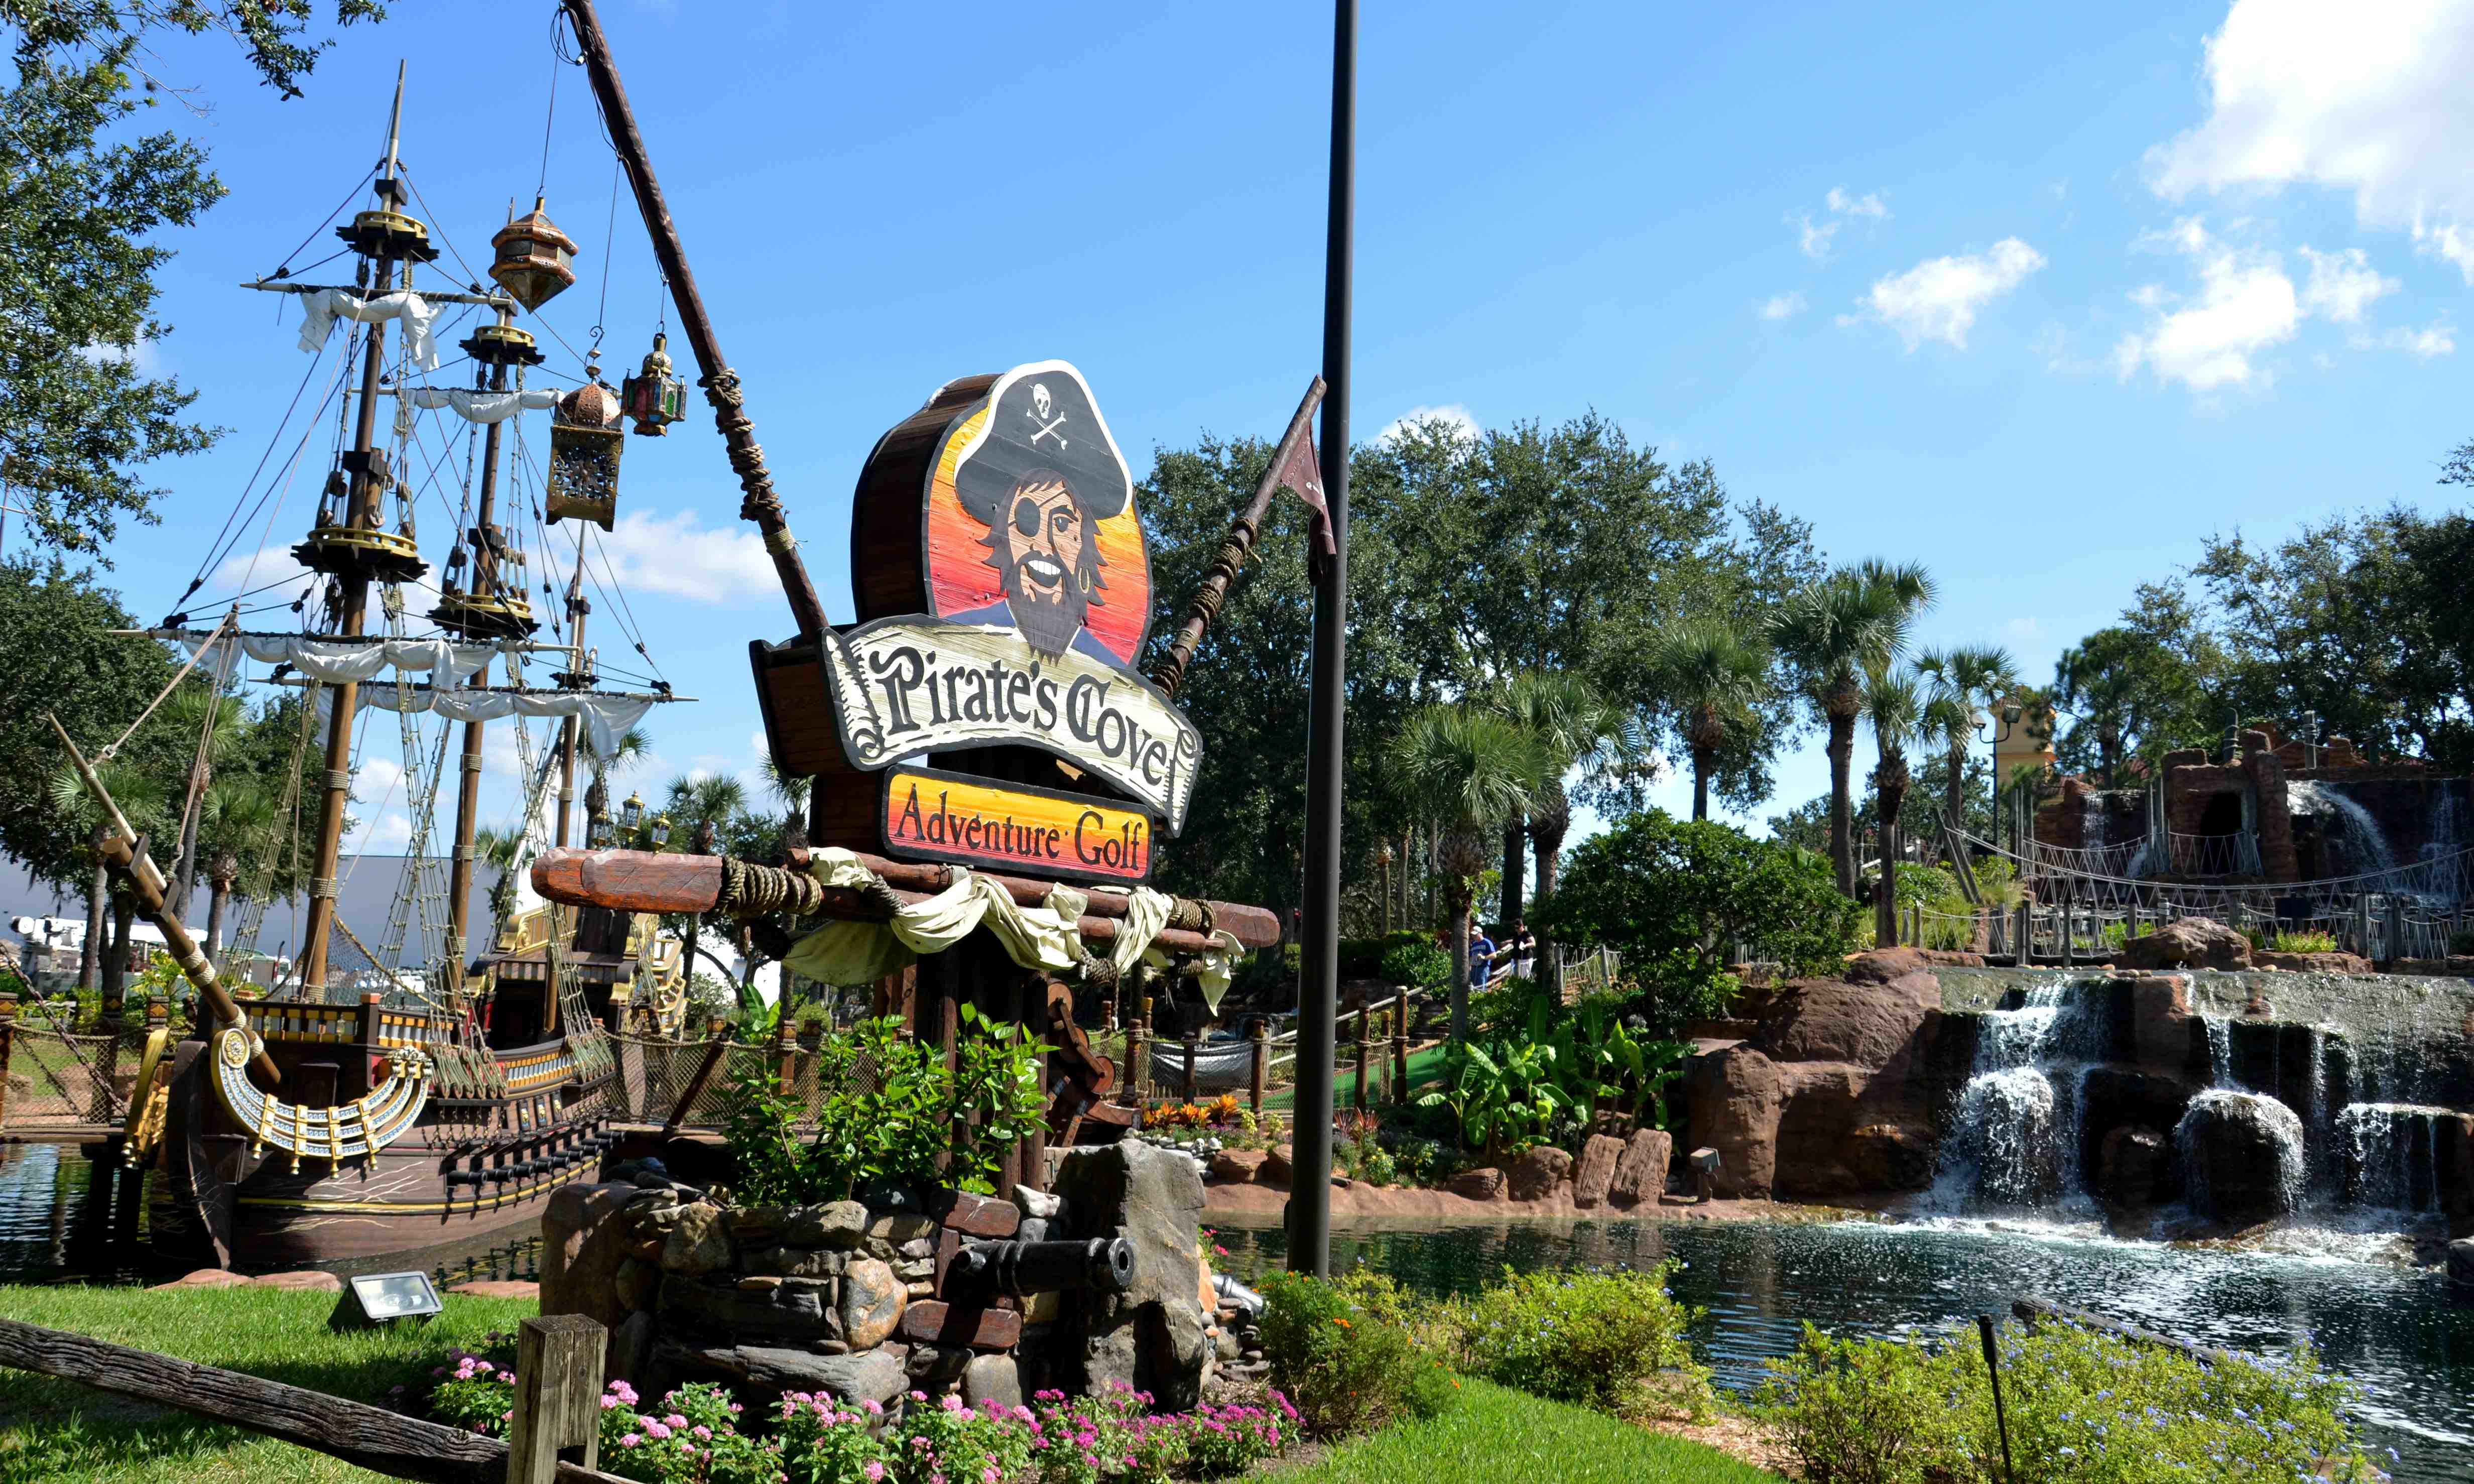 Pirates cove orlando mini golf coupons. Pirate's Cove Adventure Golf | Today's Orlando